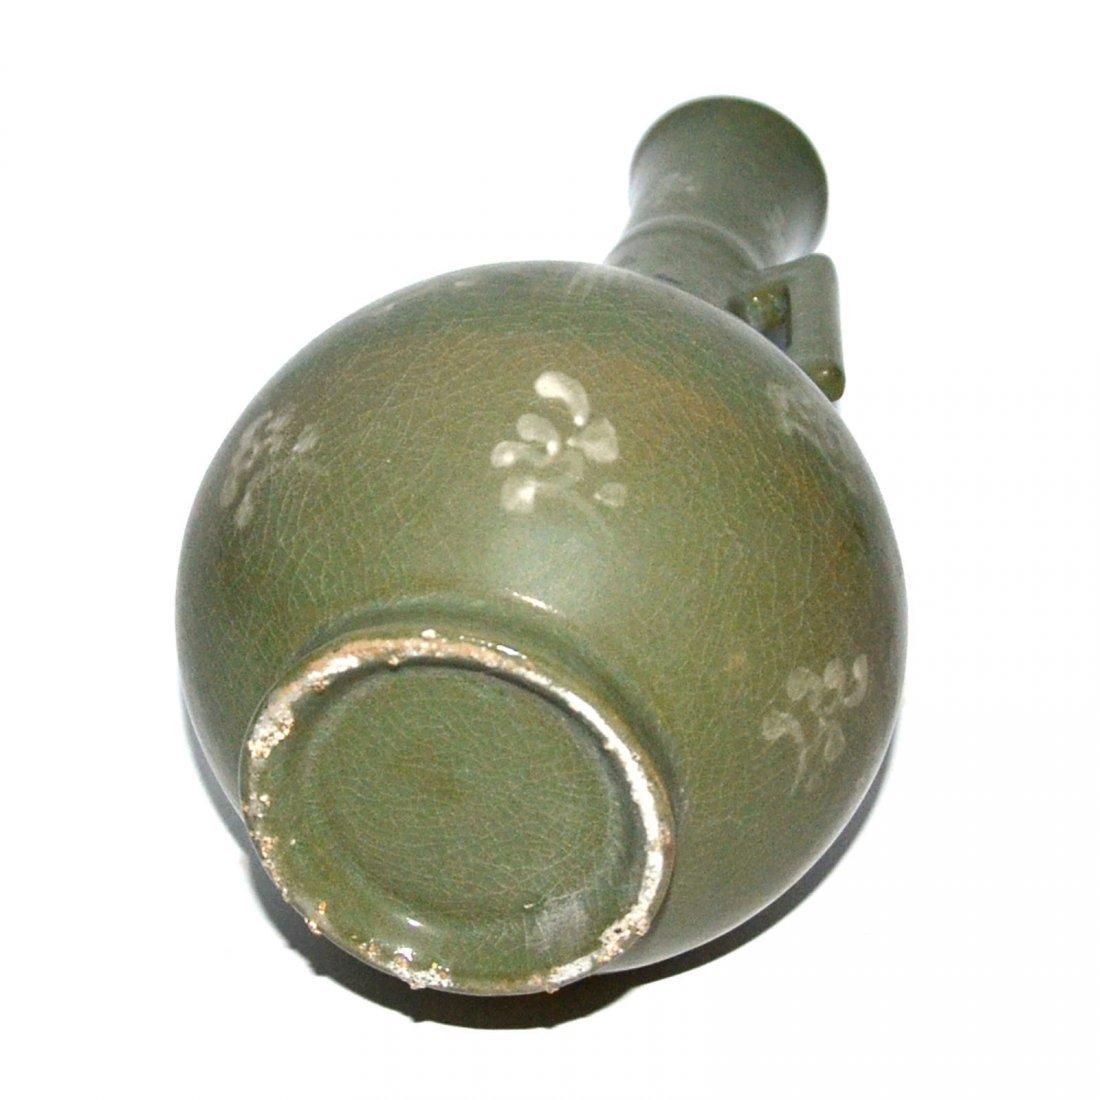 Korea, Green-glazed Crane amidst Cloud Vase with Handle - 6